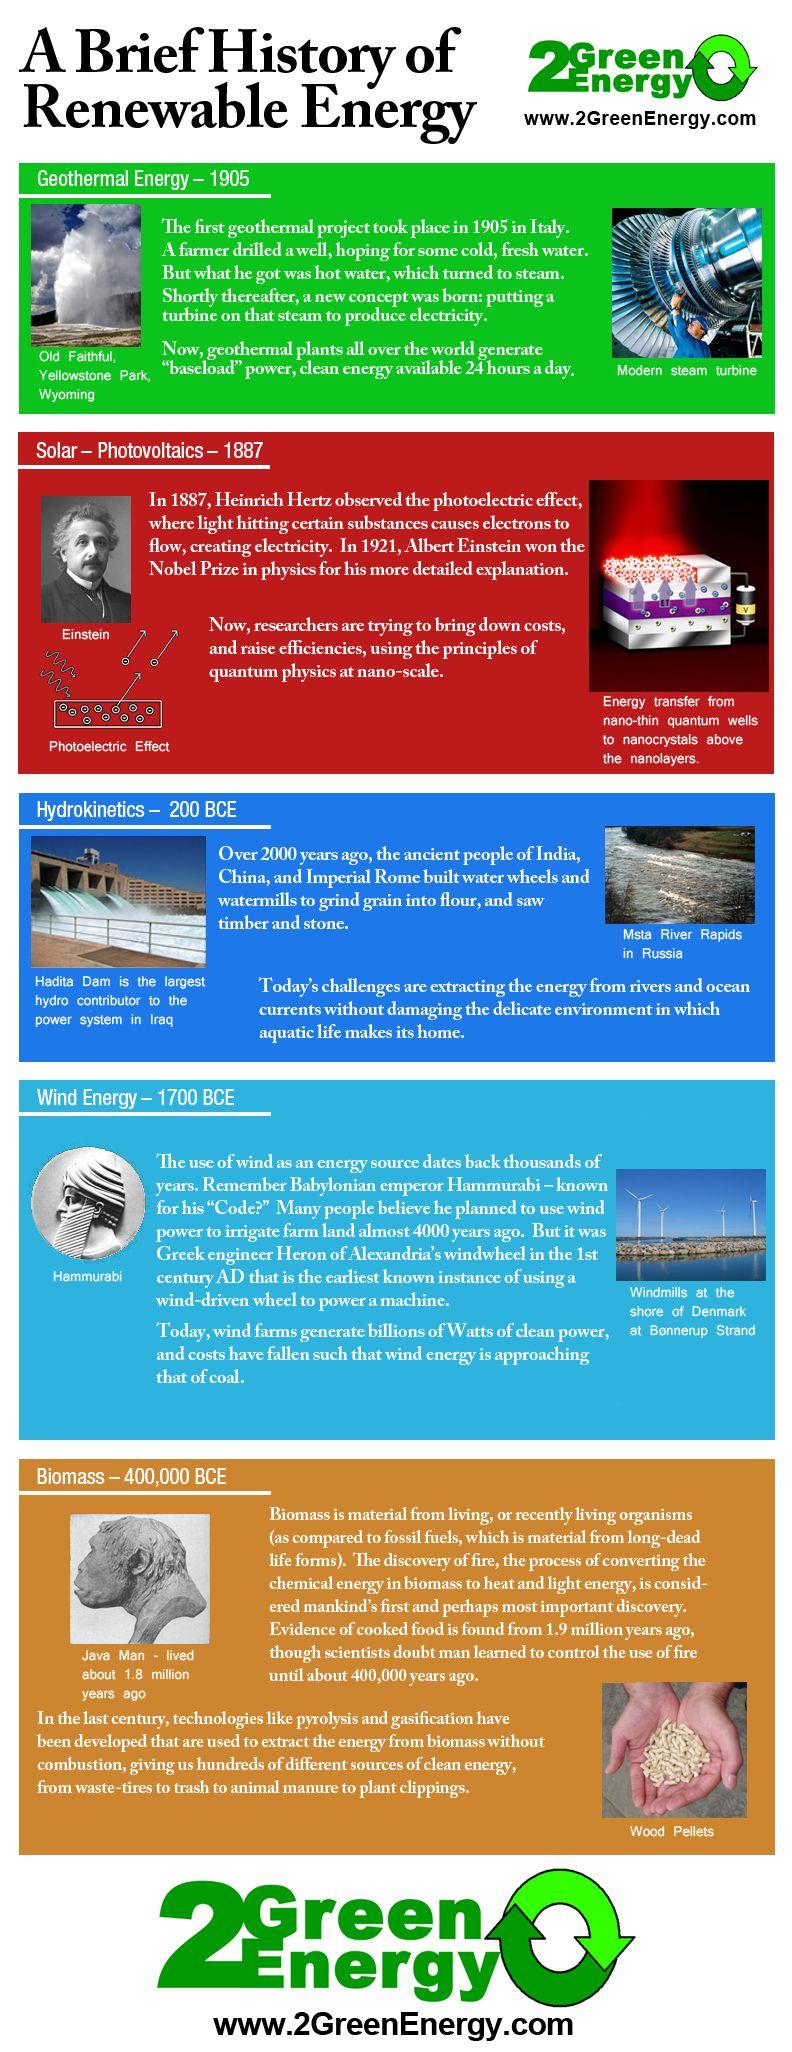 A Brief History Of Renewable Energy Infographic Renewable Energy Geothermal Energy Alternative Energy